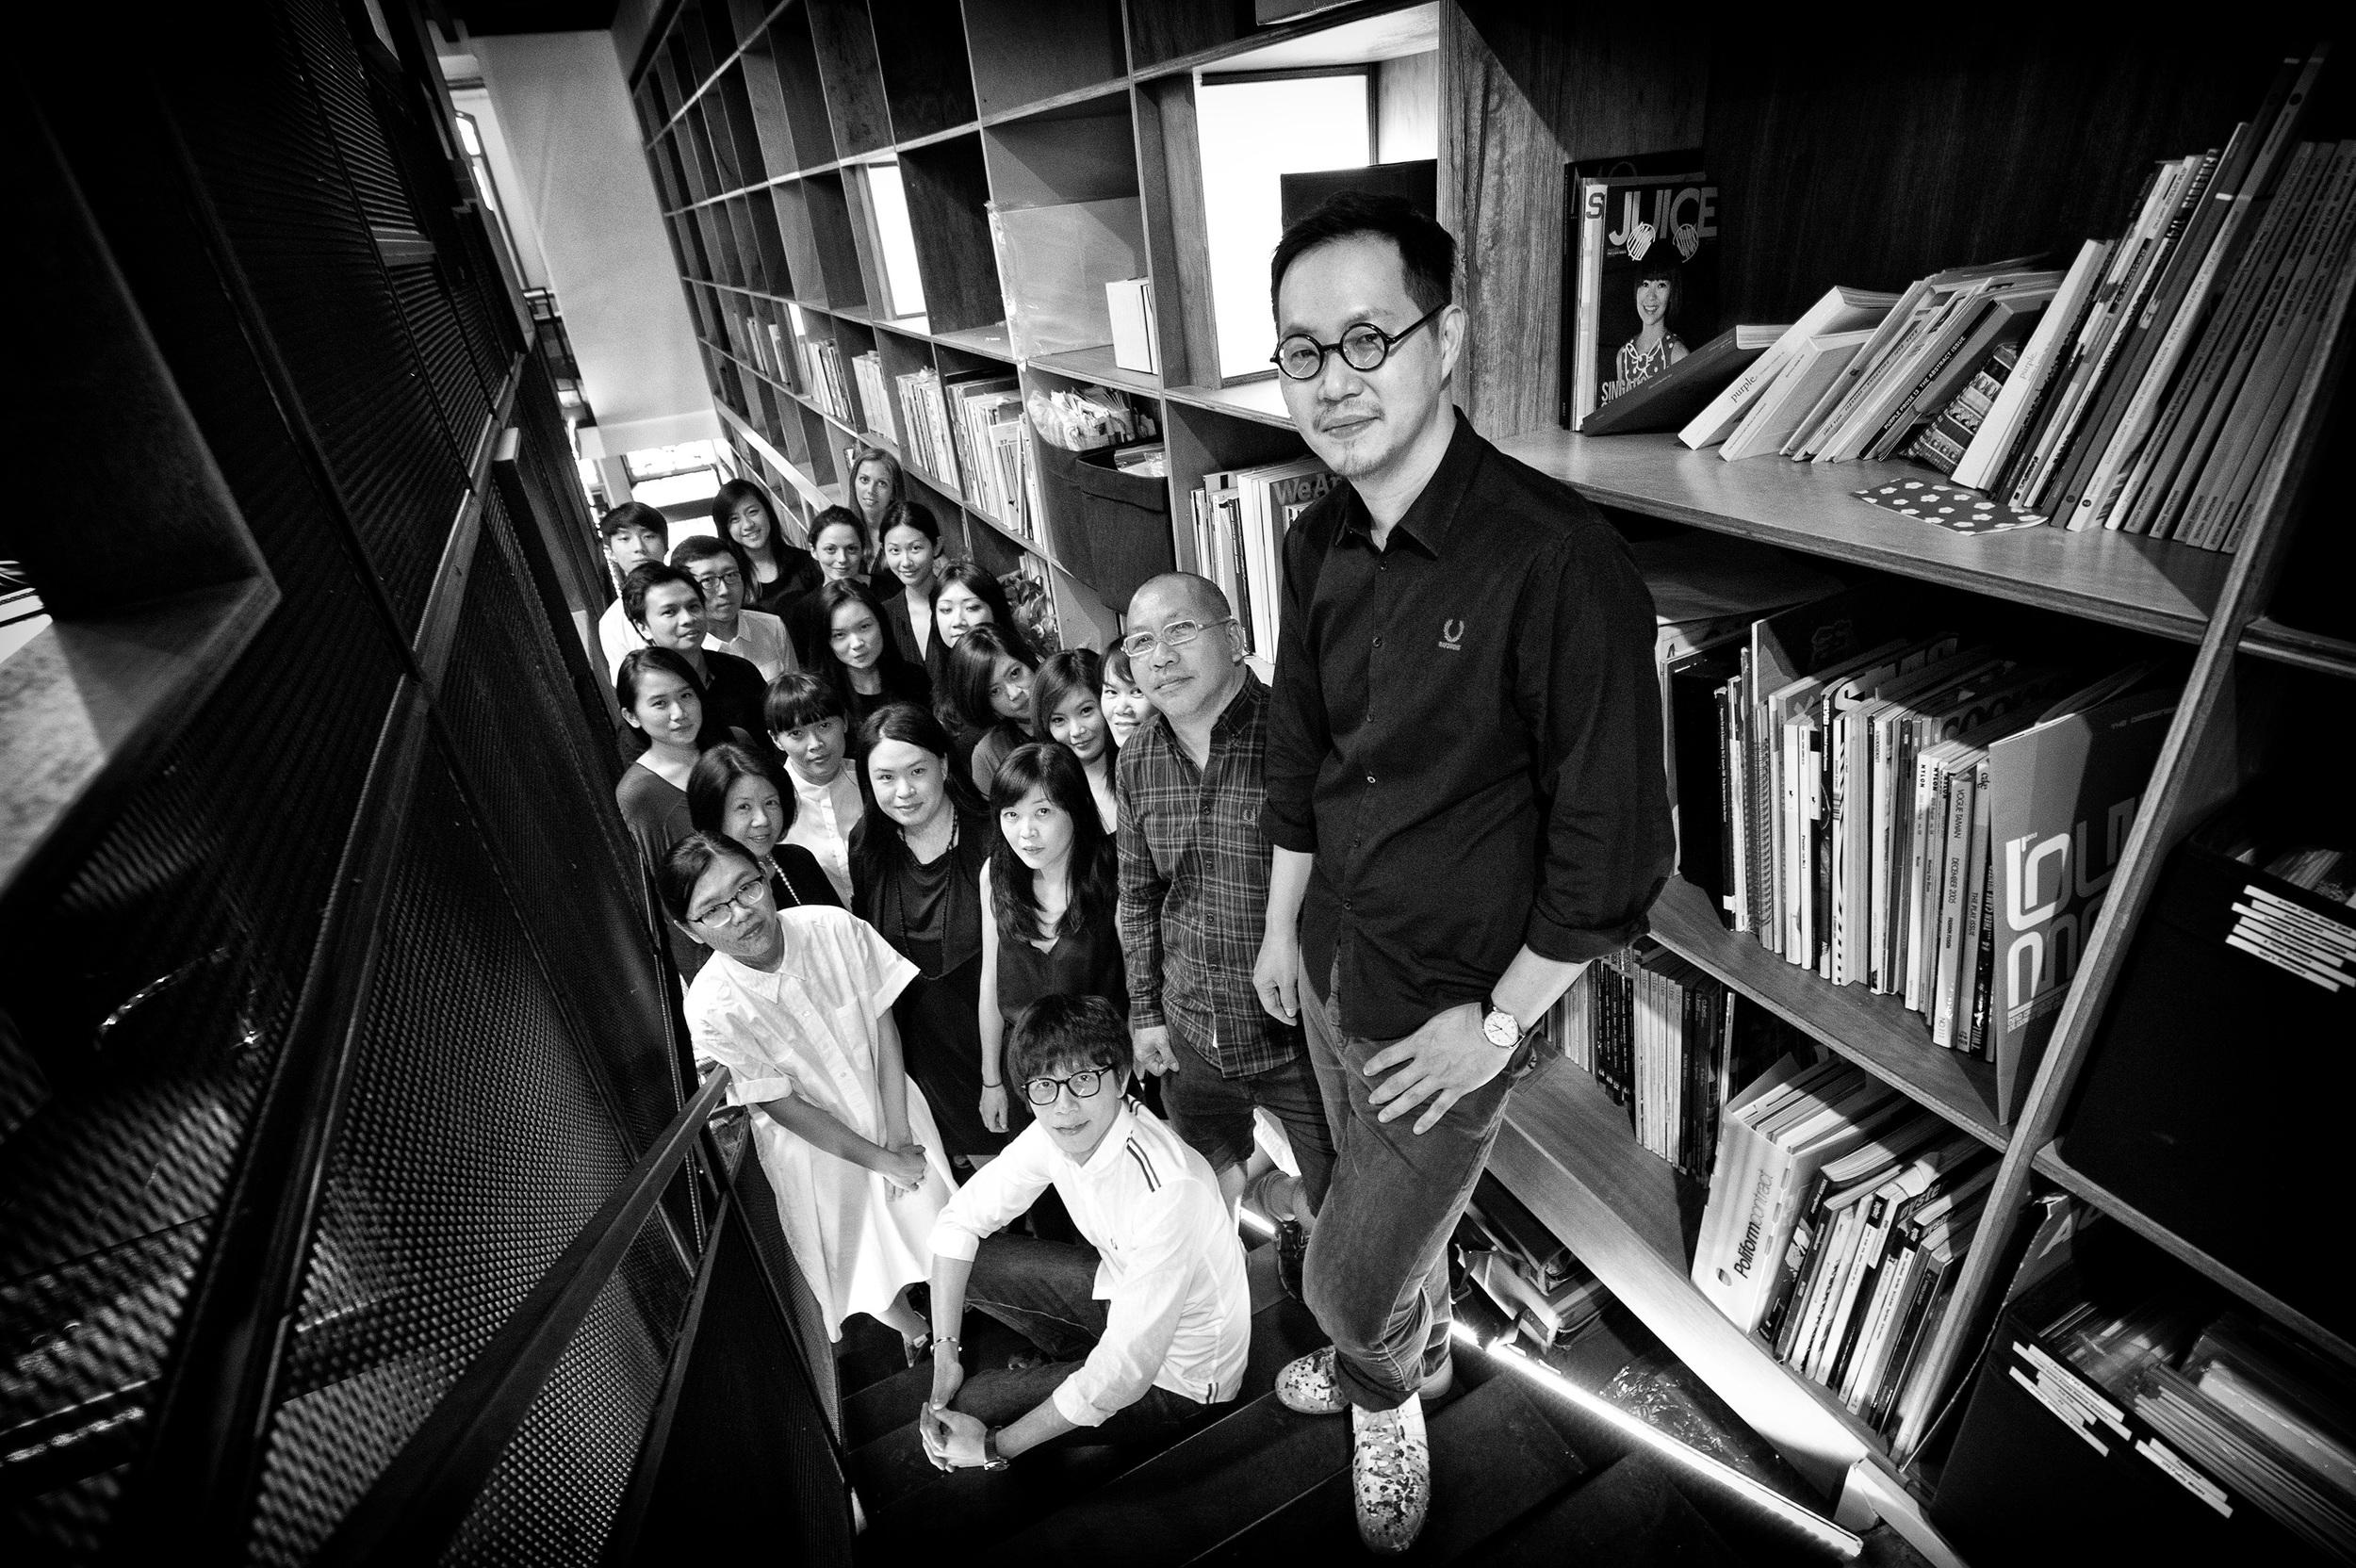 Chris Lee: Creative Director, Asylum and Amnesty